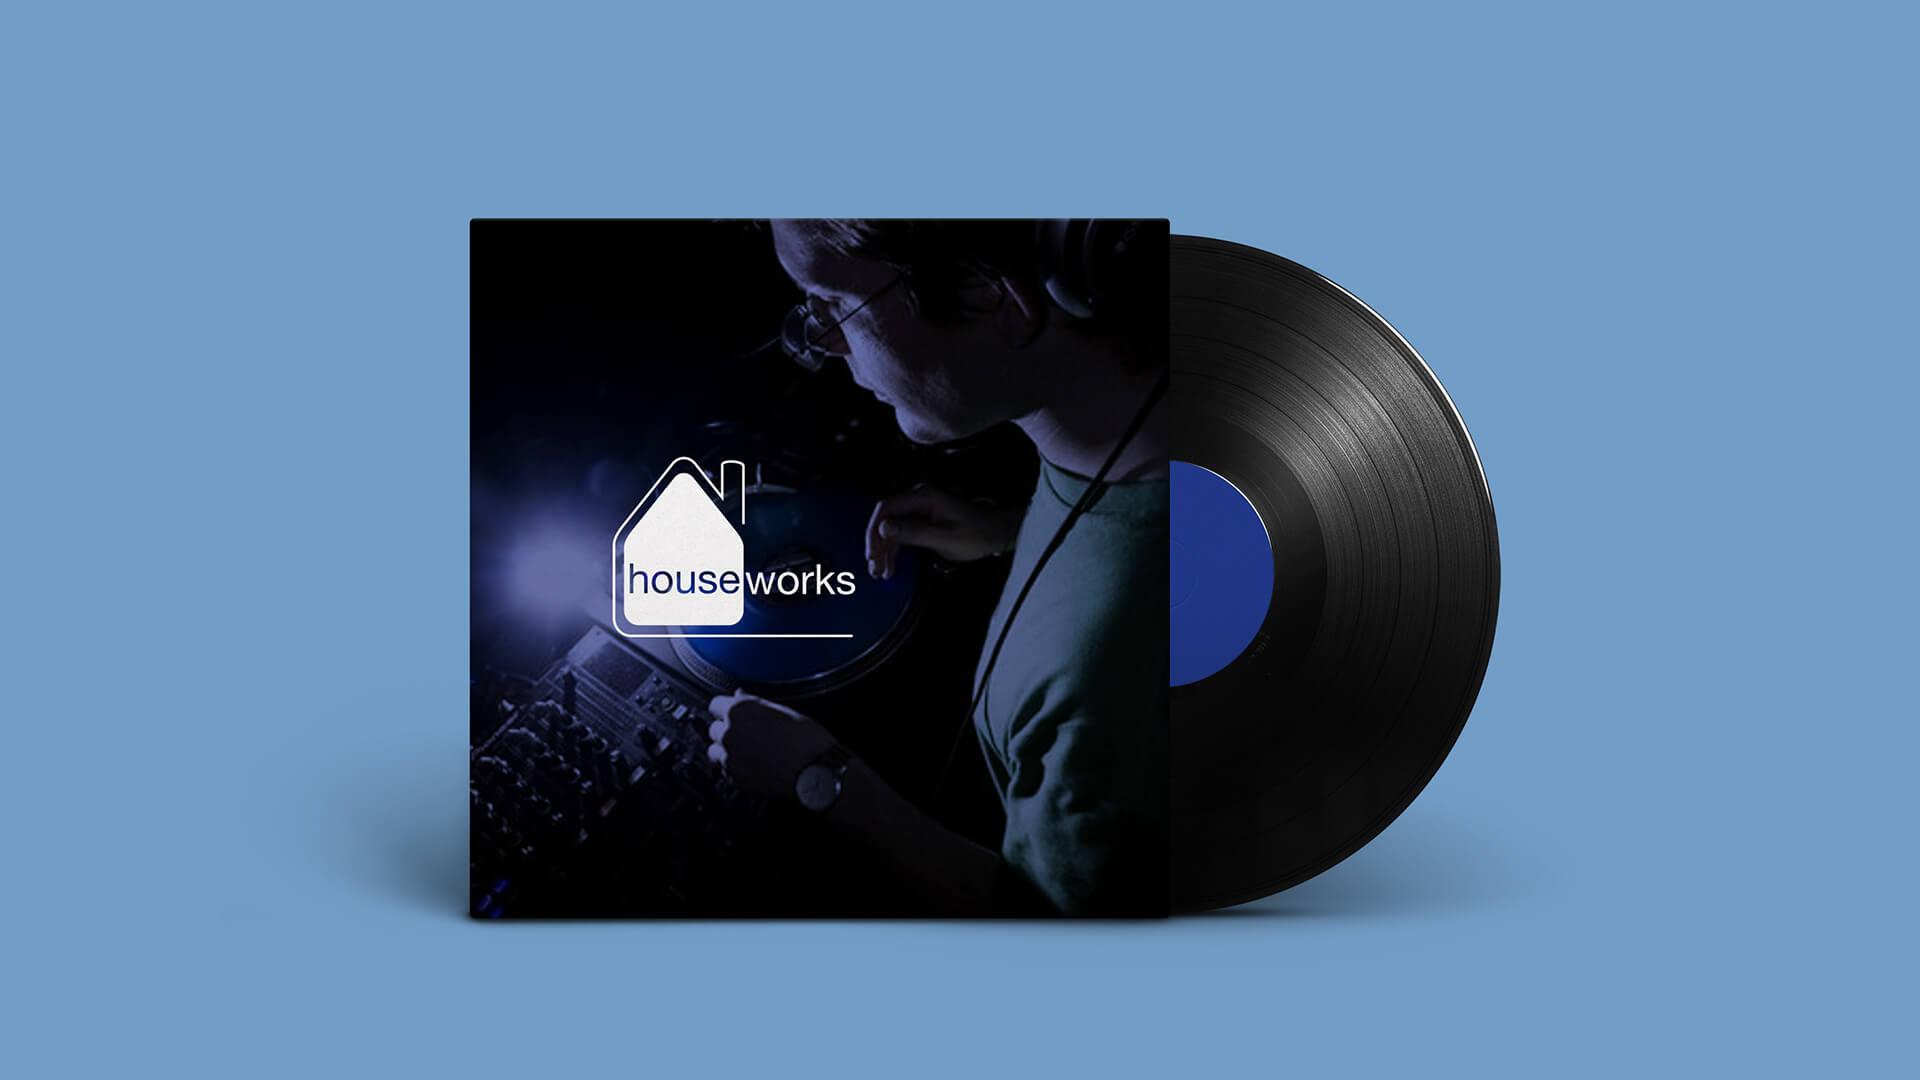 Houseworks Logo on a LP Sleeve